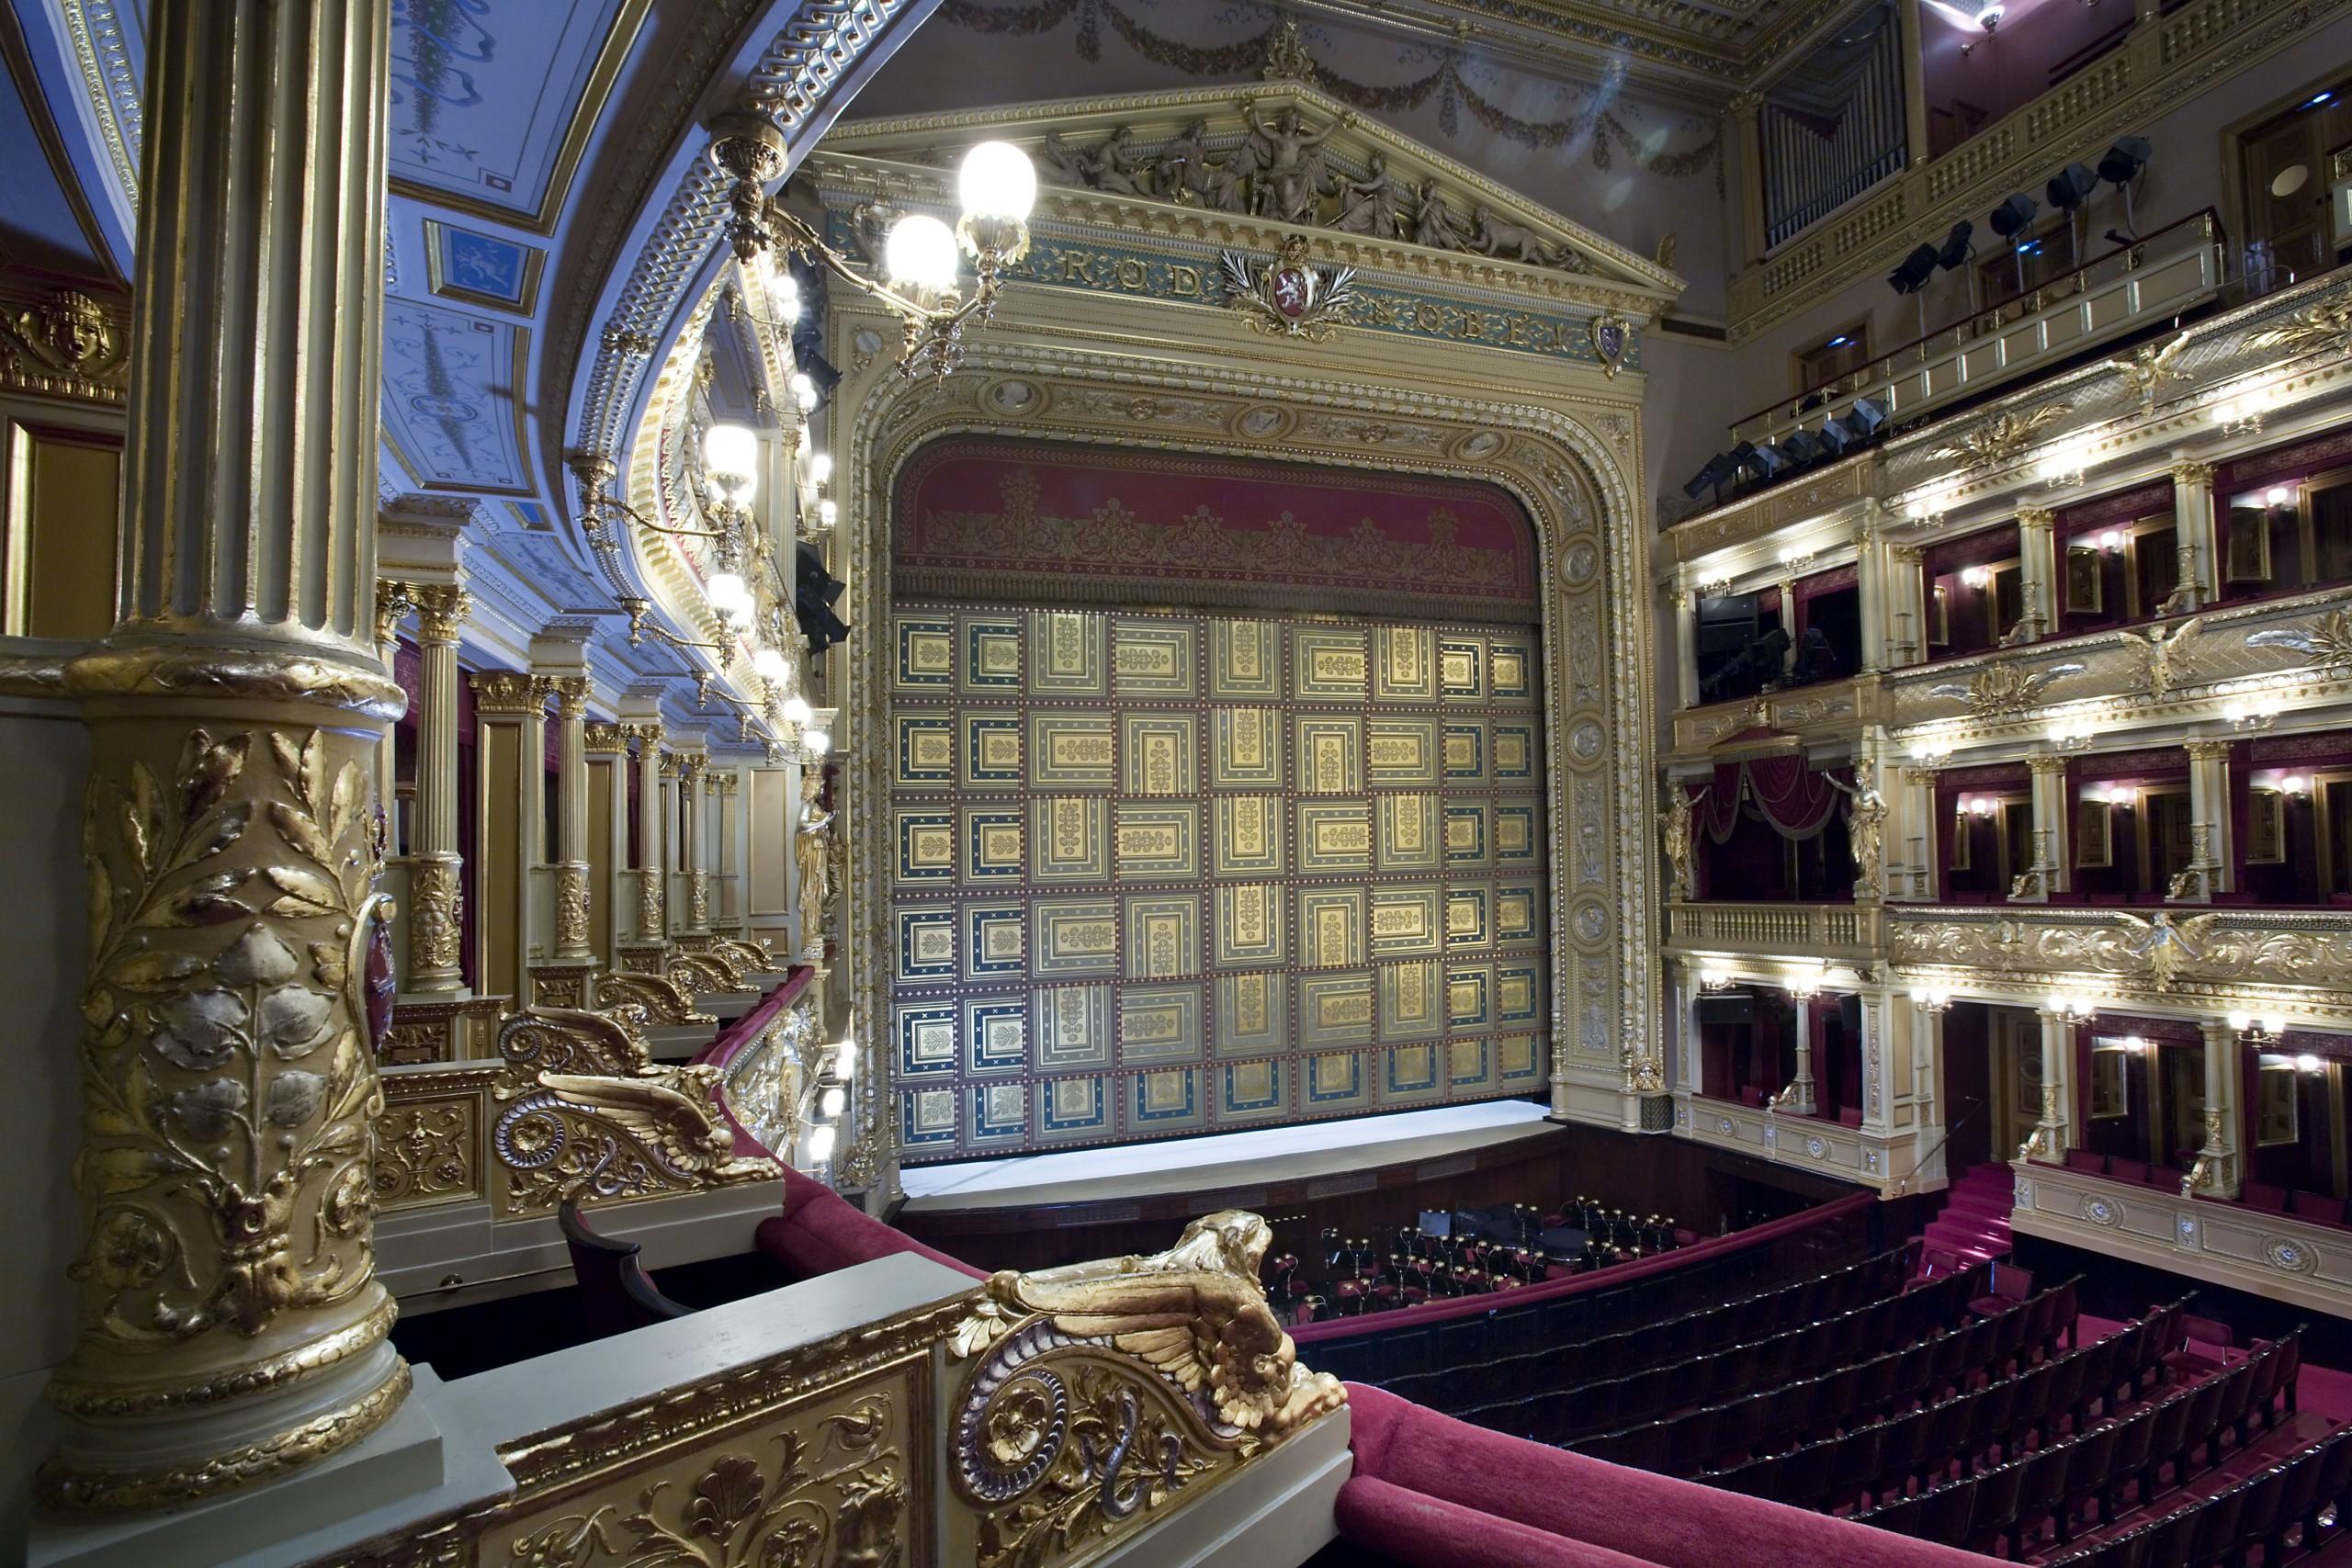 Narodni Divadlo, National Theater, Prague